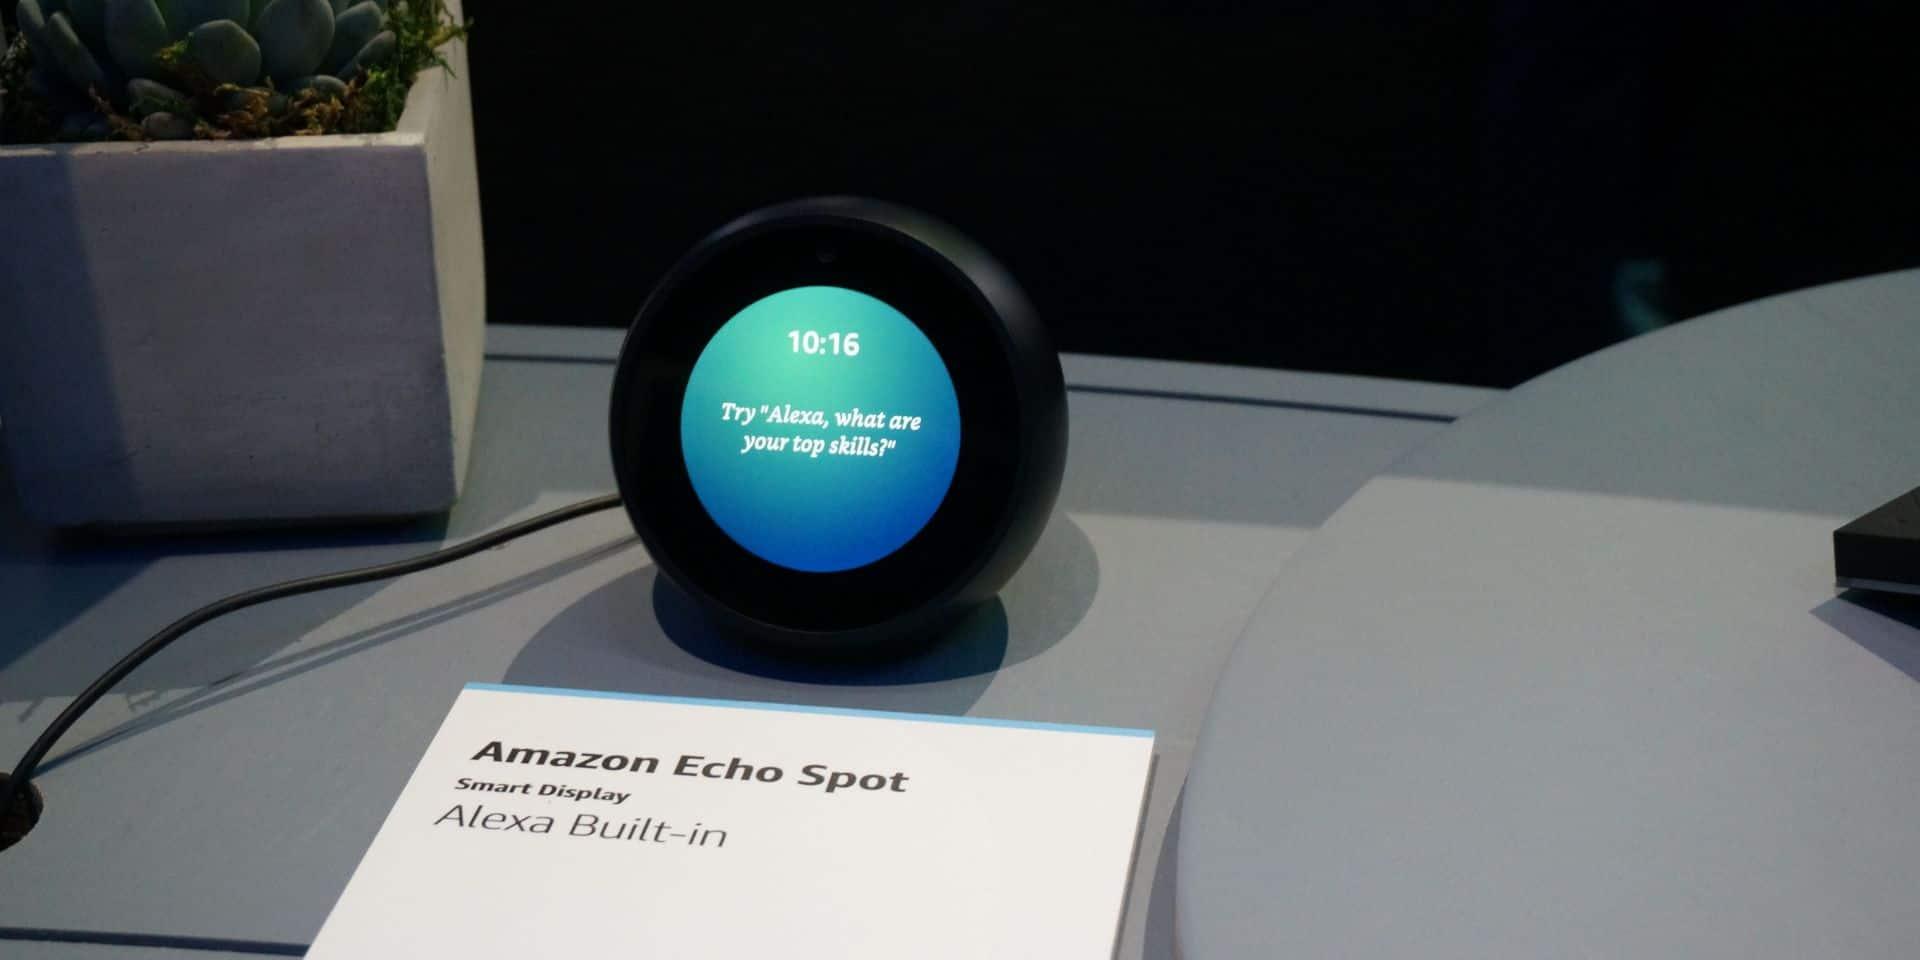 Alexa et Siri vont pouvoir discuter ensemble